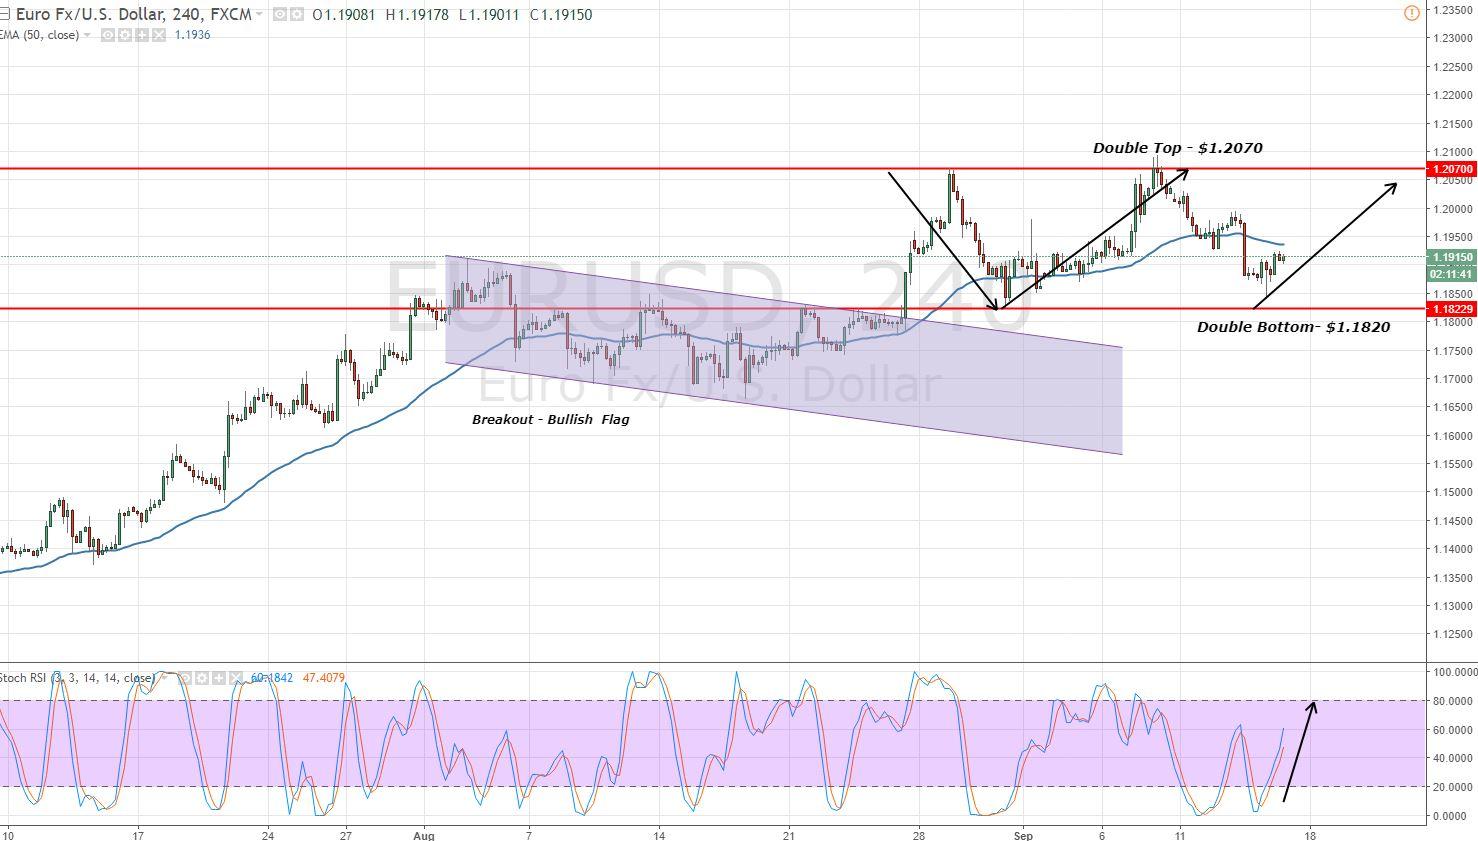 EURUSD - Broad Trading Range